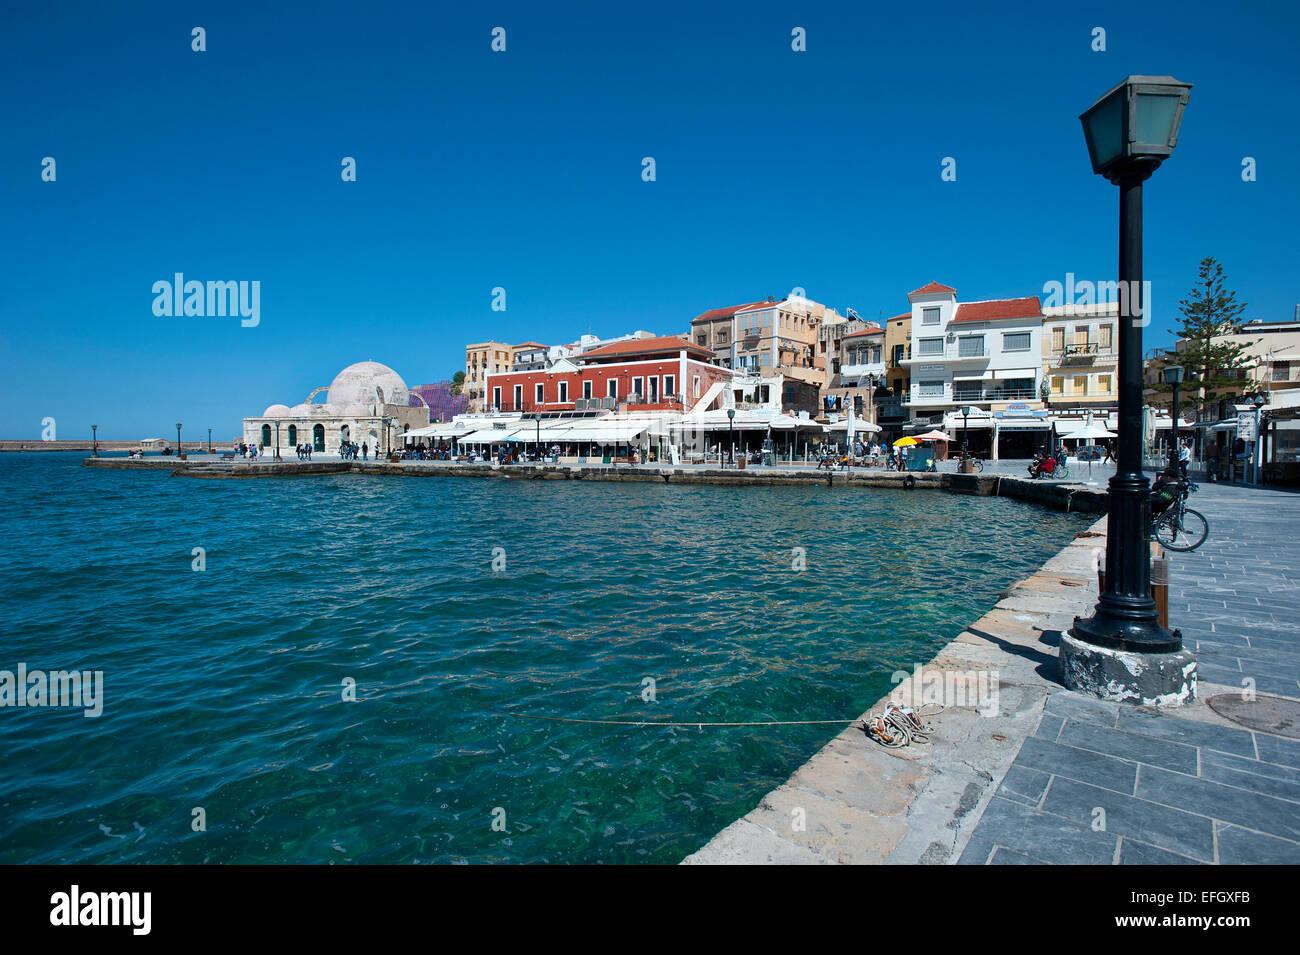 Venetian Harbour, Chania, Crete, Greece - Stock Image